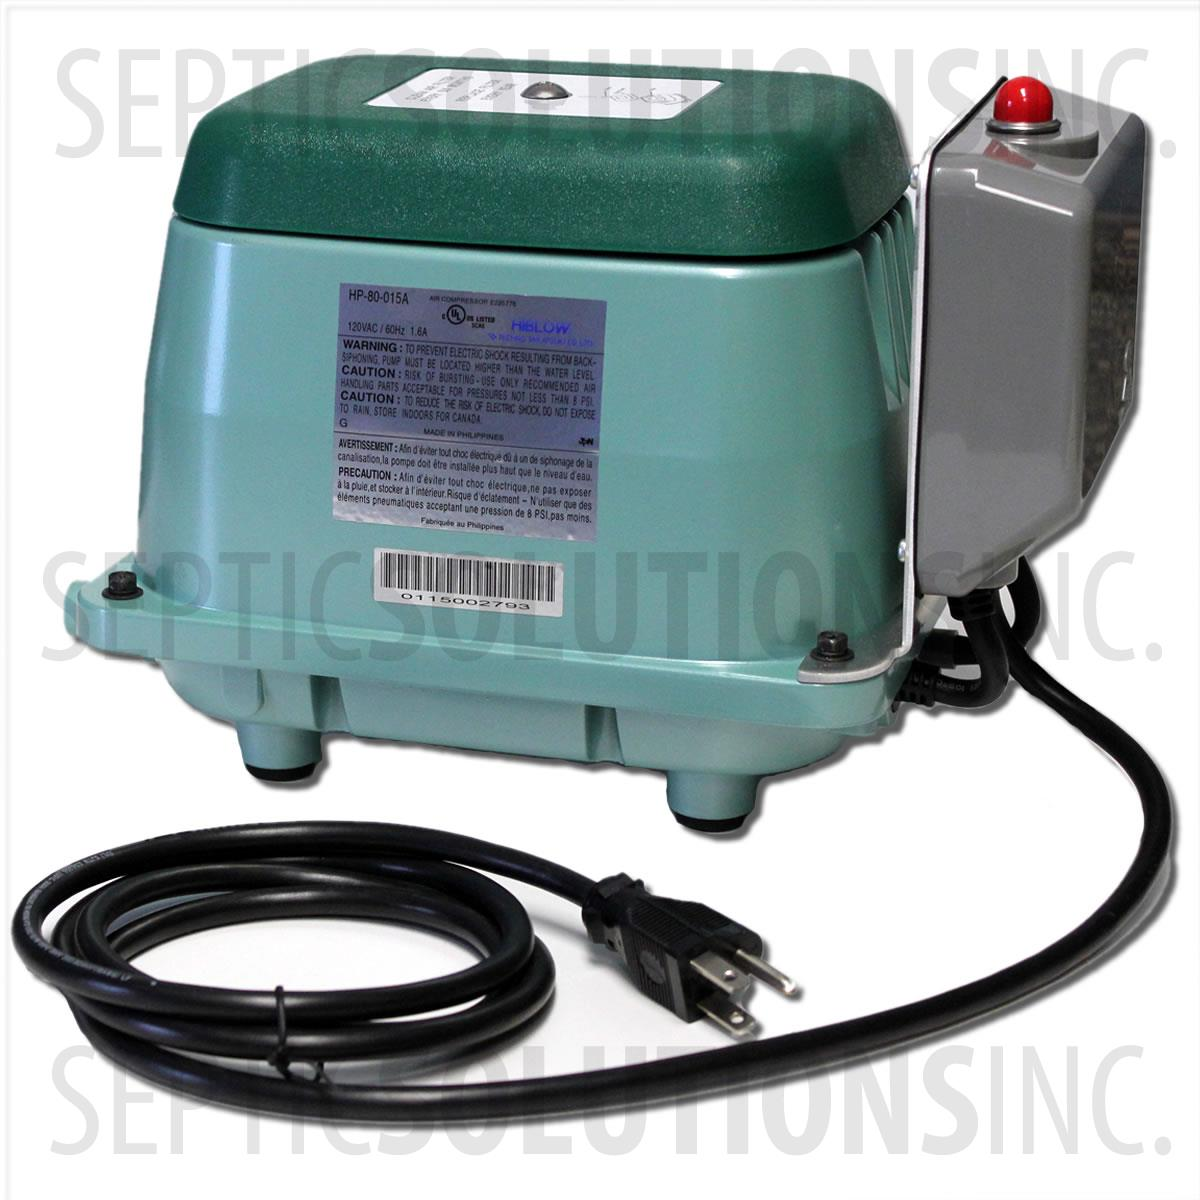 Hiblow Hp 80 013a Septic Air Pump With Alarm Free Same